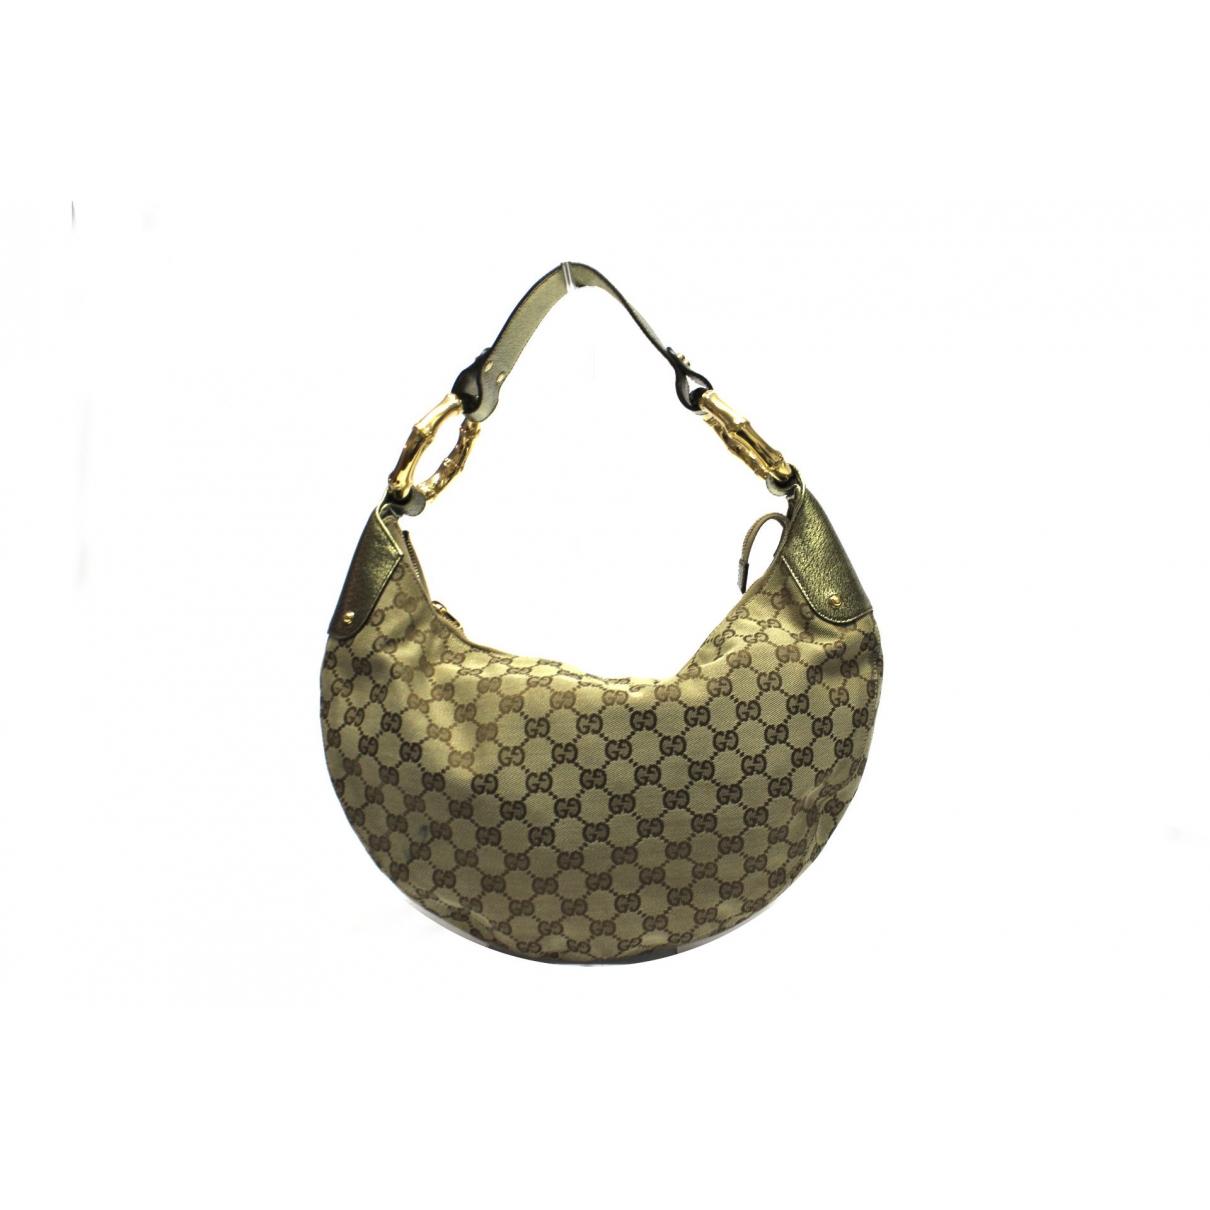 Gucci Hobo Handtasche in  Beige Leinen